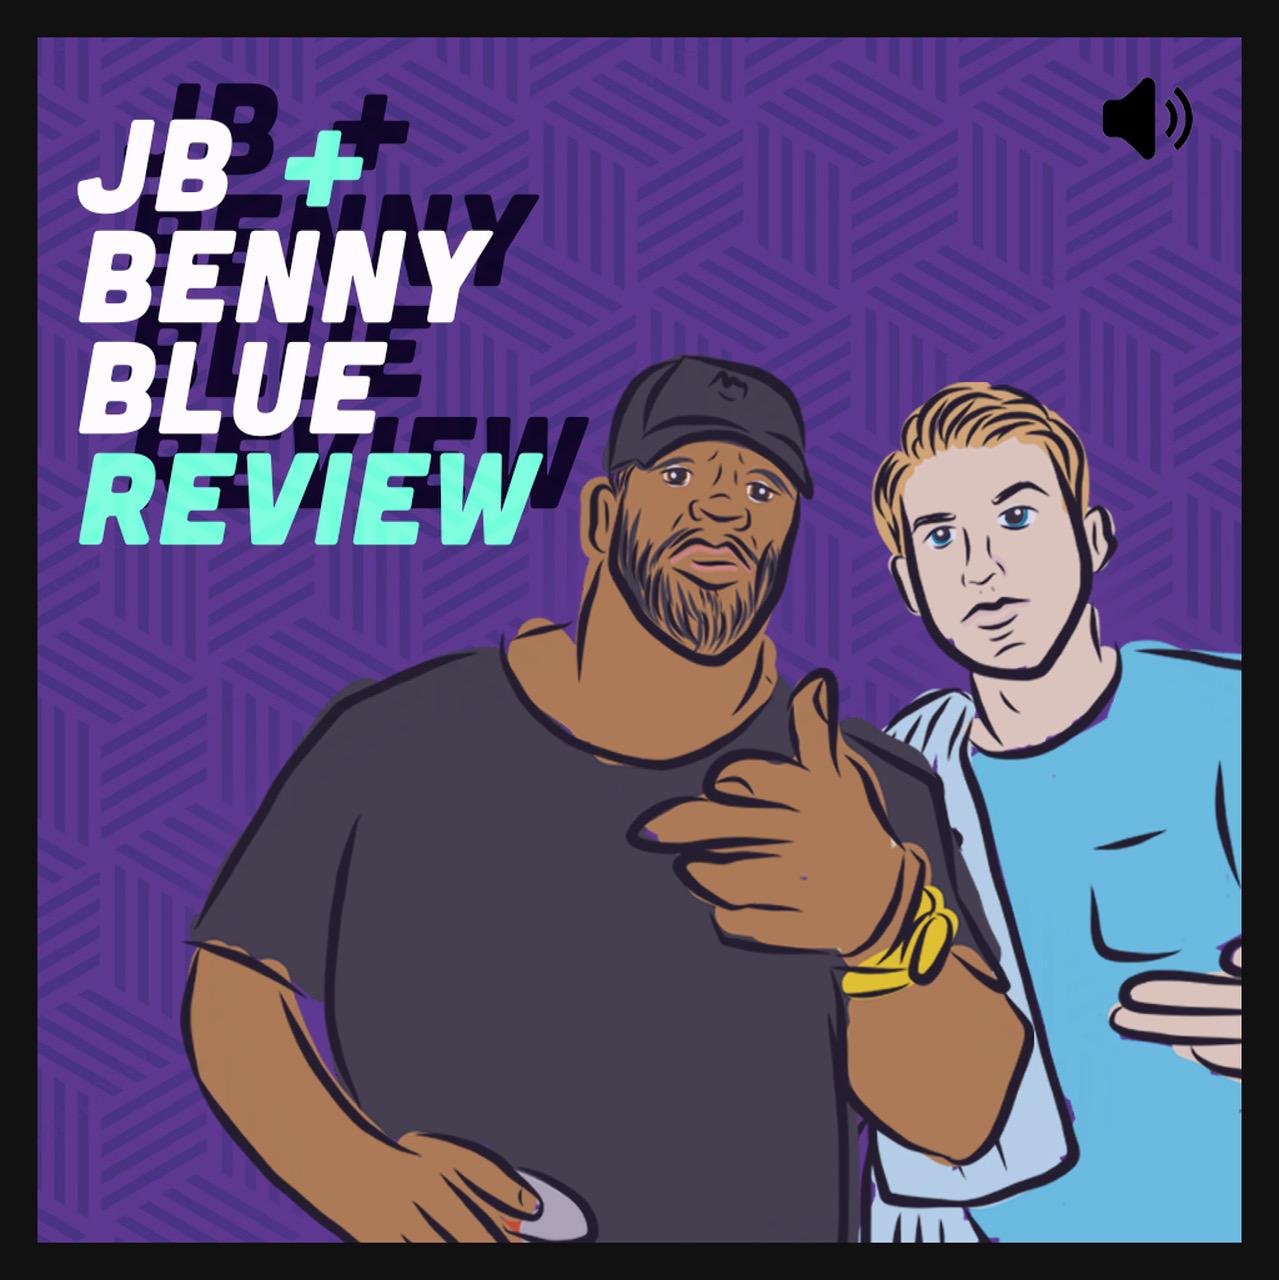 JB_Benny_review_Podcast_2.jpg